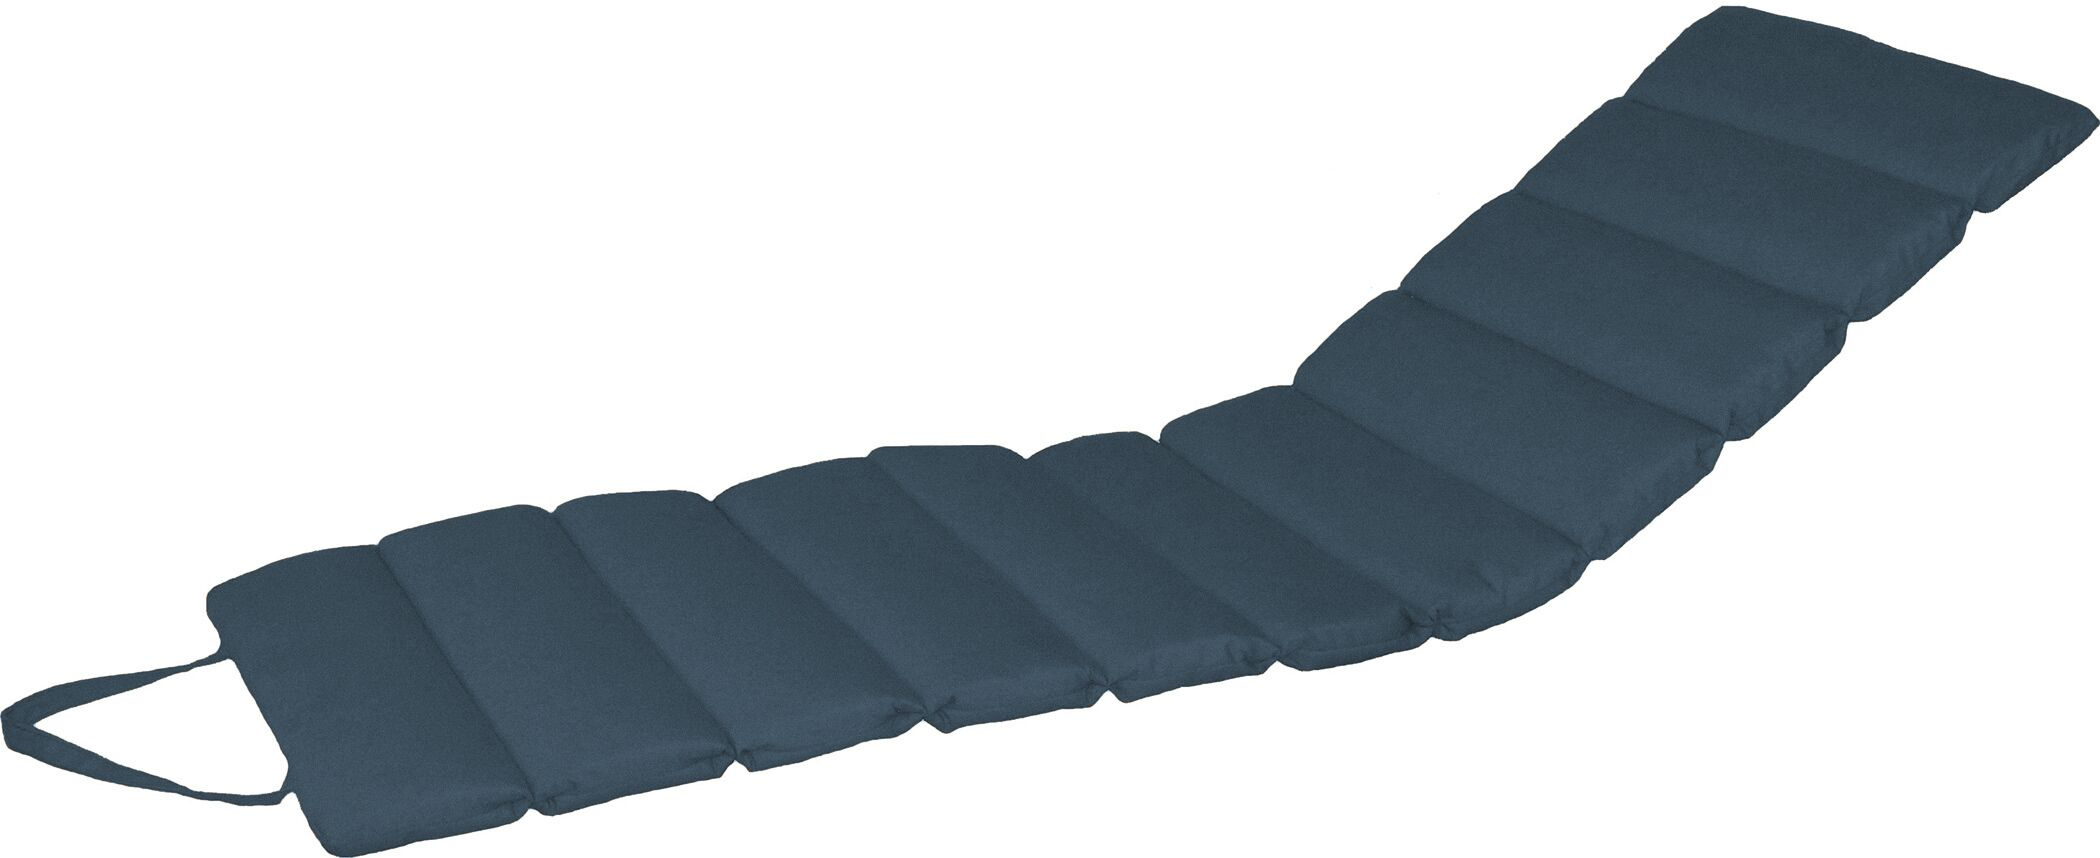 Channeled Indoor/Outdoor Sunbrella Chaise Lounge Cushion Fabric: Indigo